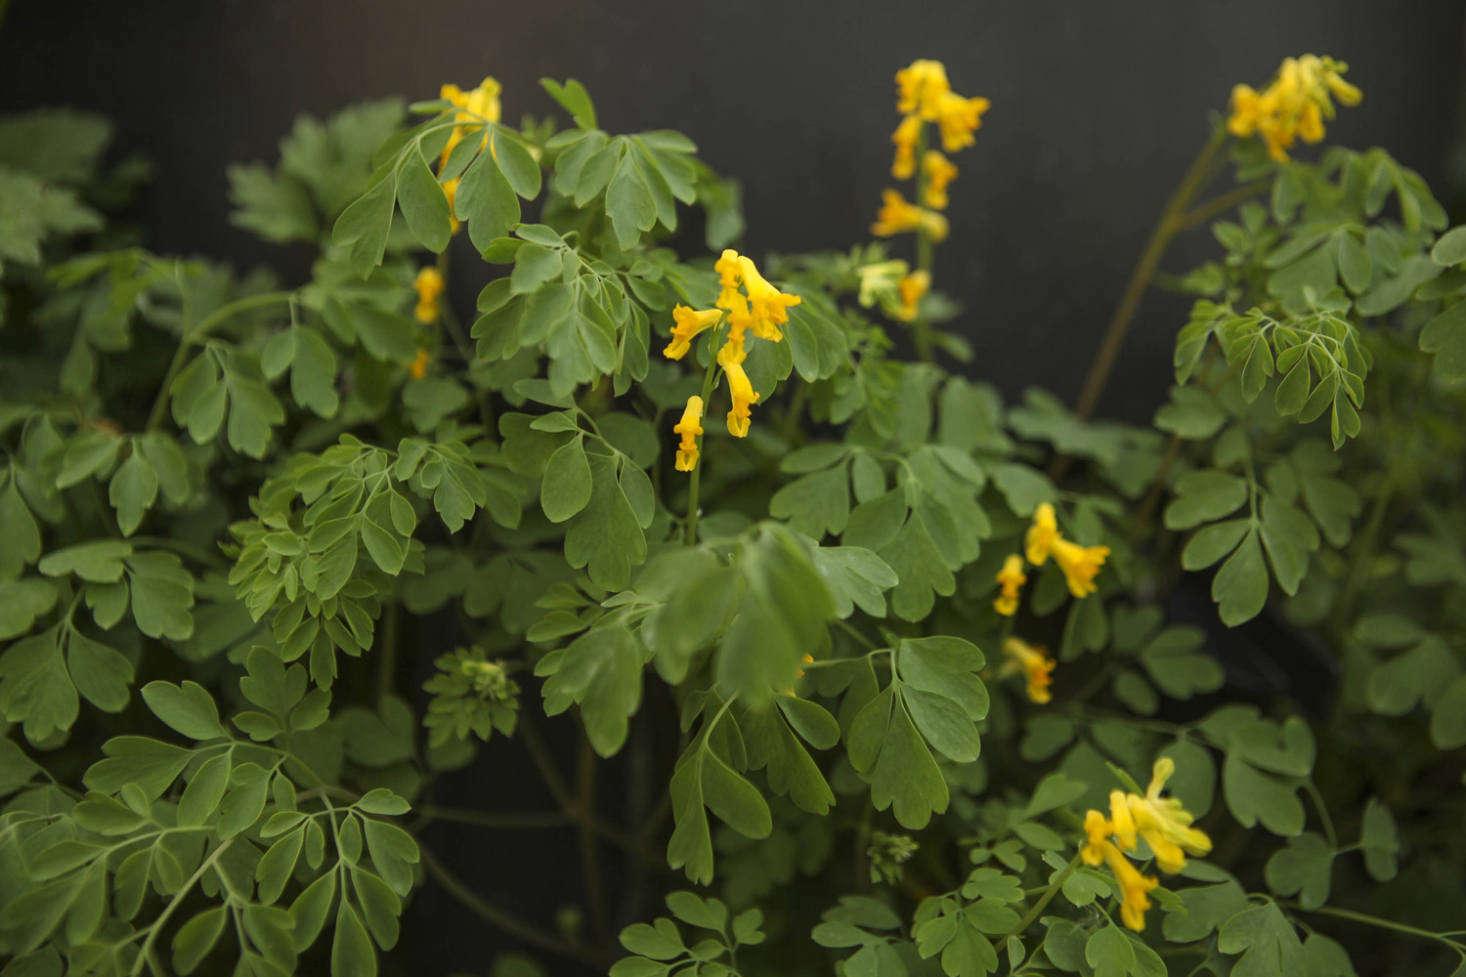 Corydalis lutea, meaning &#8